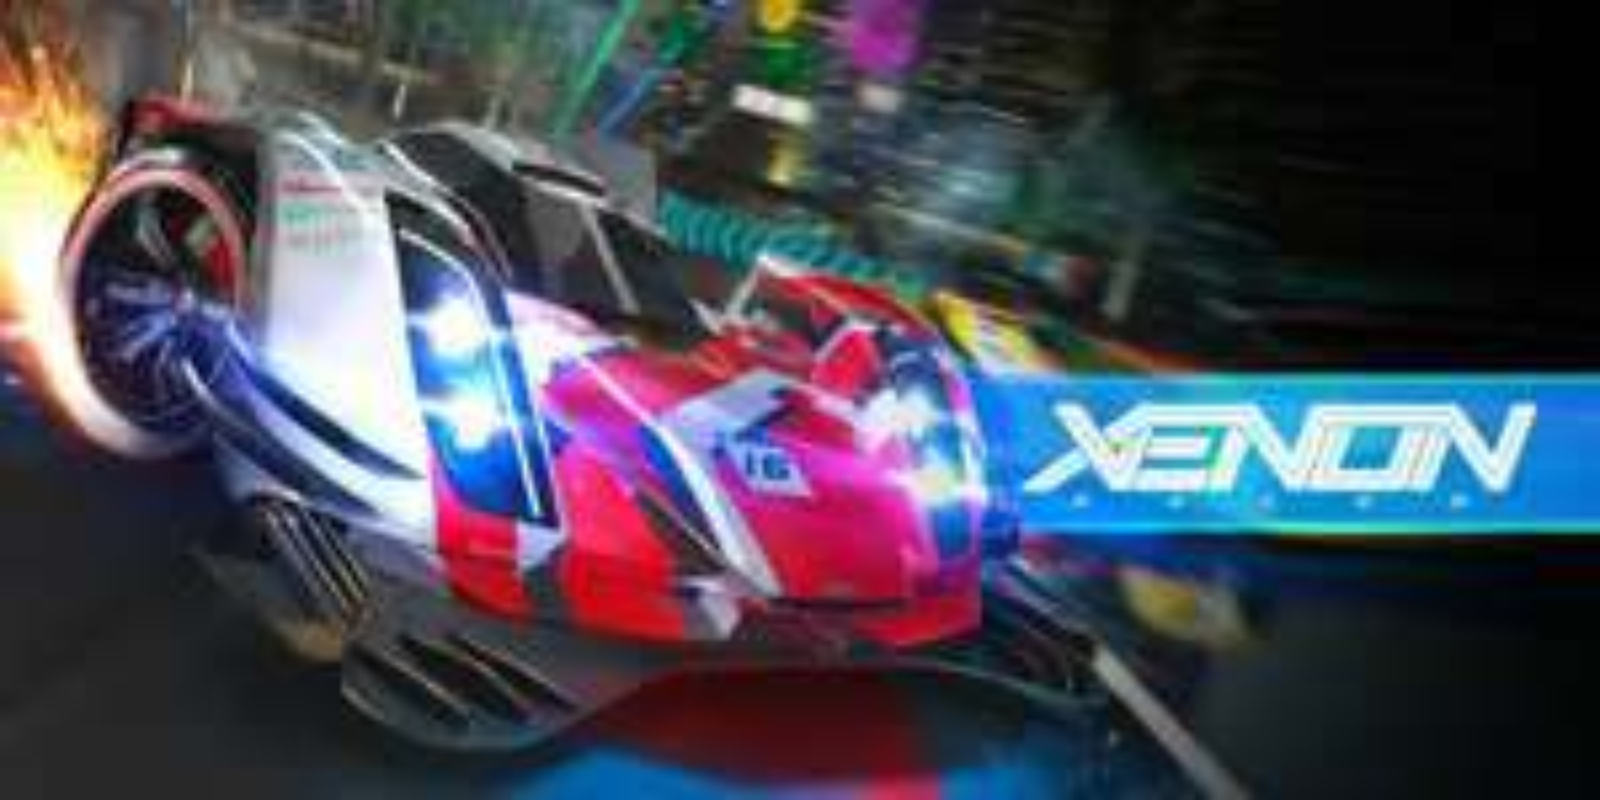 Xenon Racer - Nintendo Switch eshop (S. Africa)  £8.11